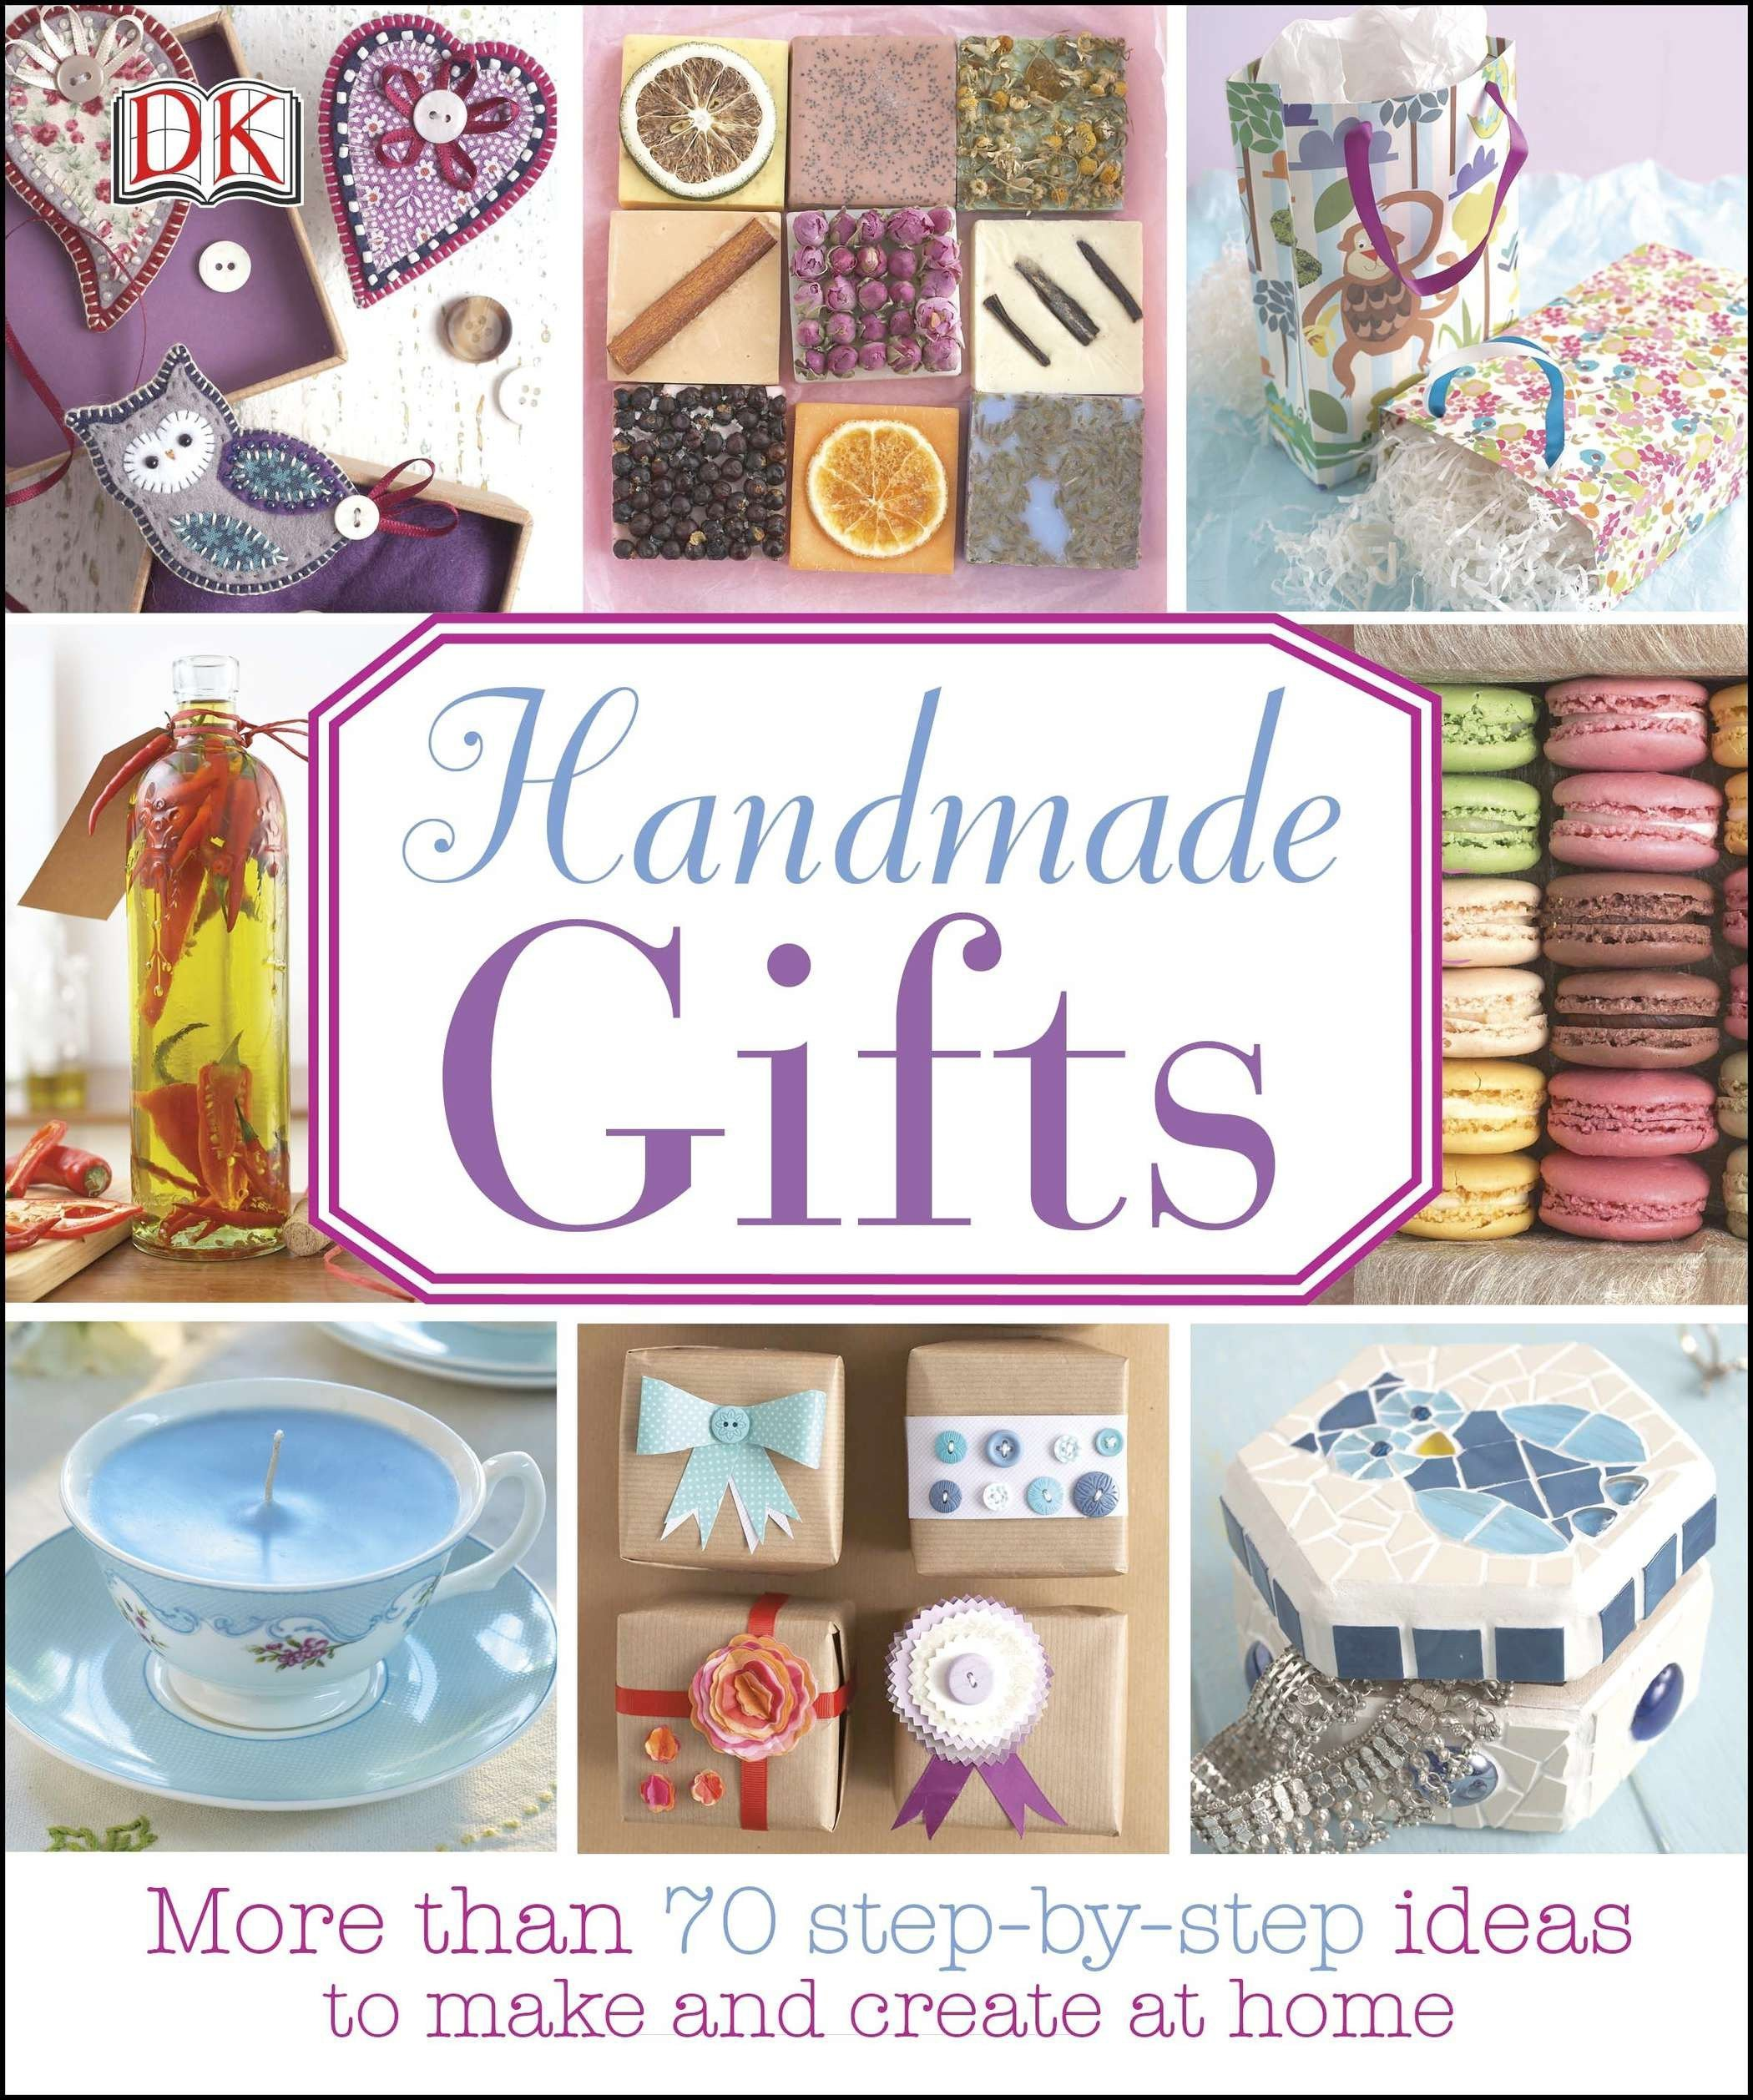 Handmade Gifts: DK: 9781465408402: Amazon.com: Books